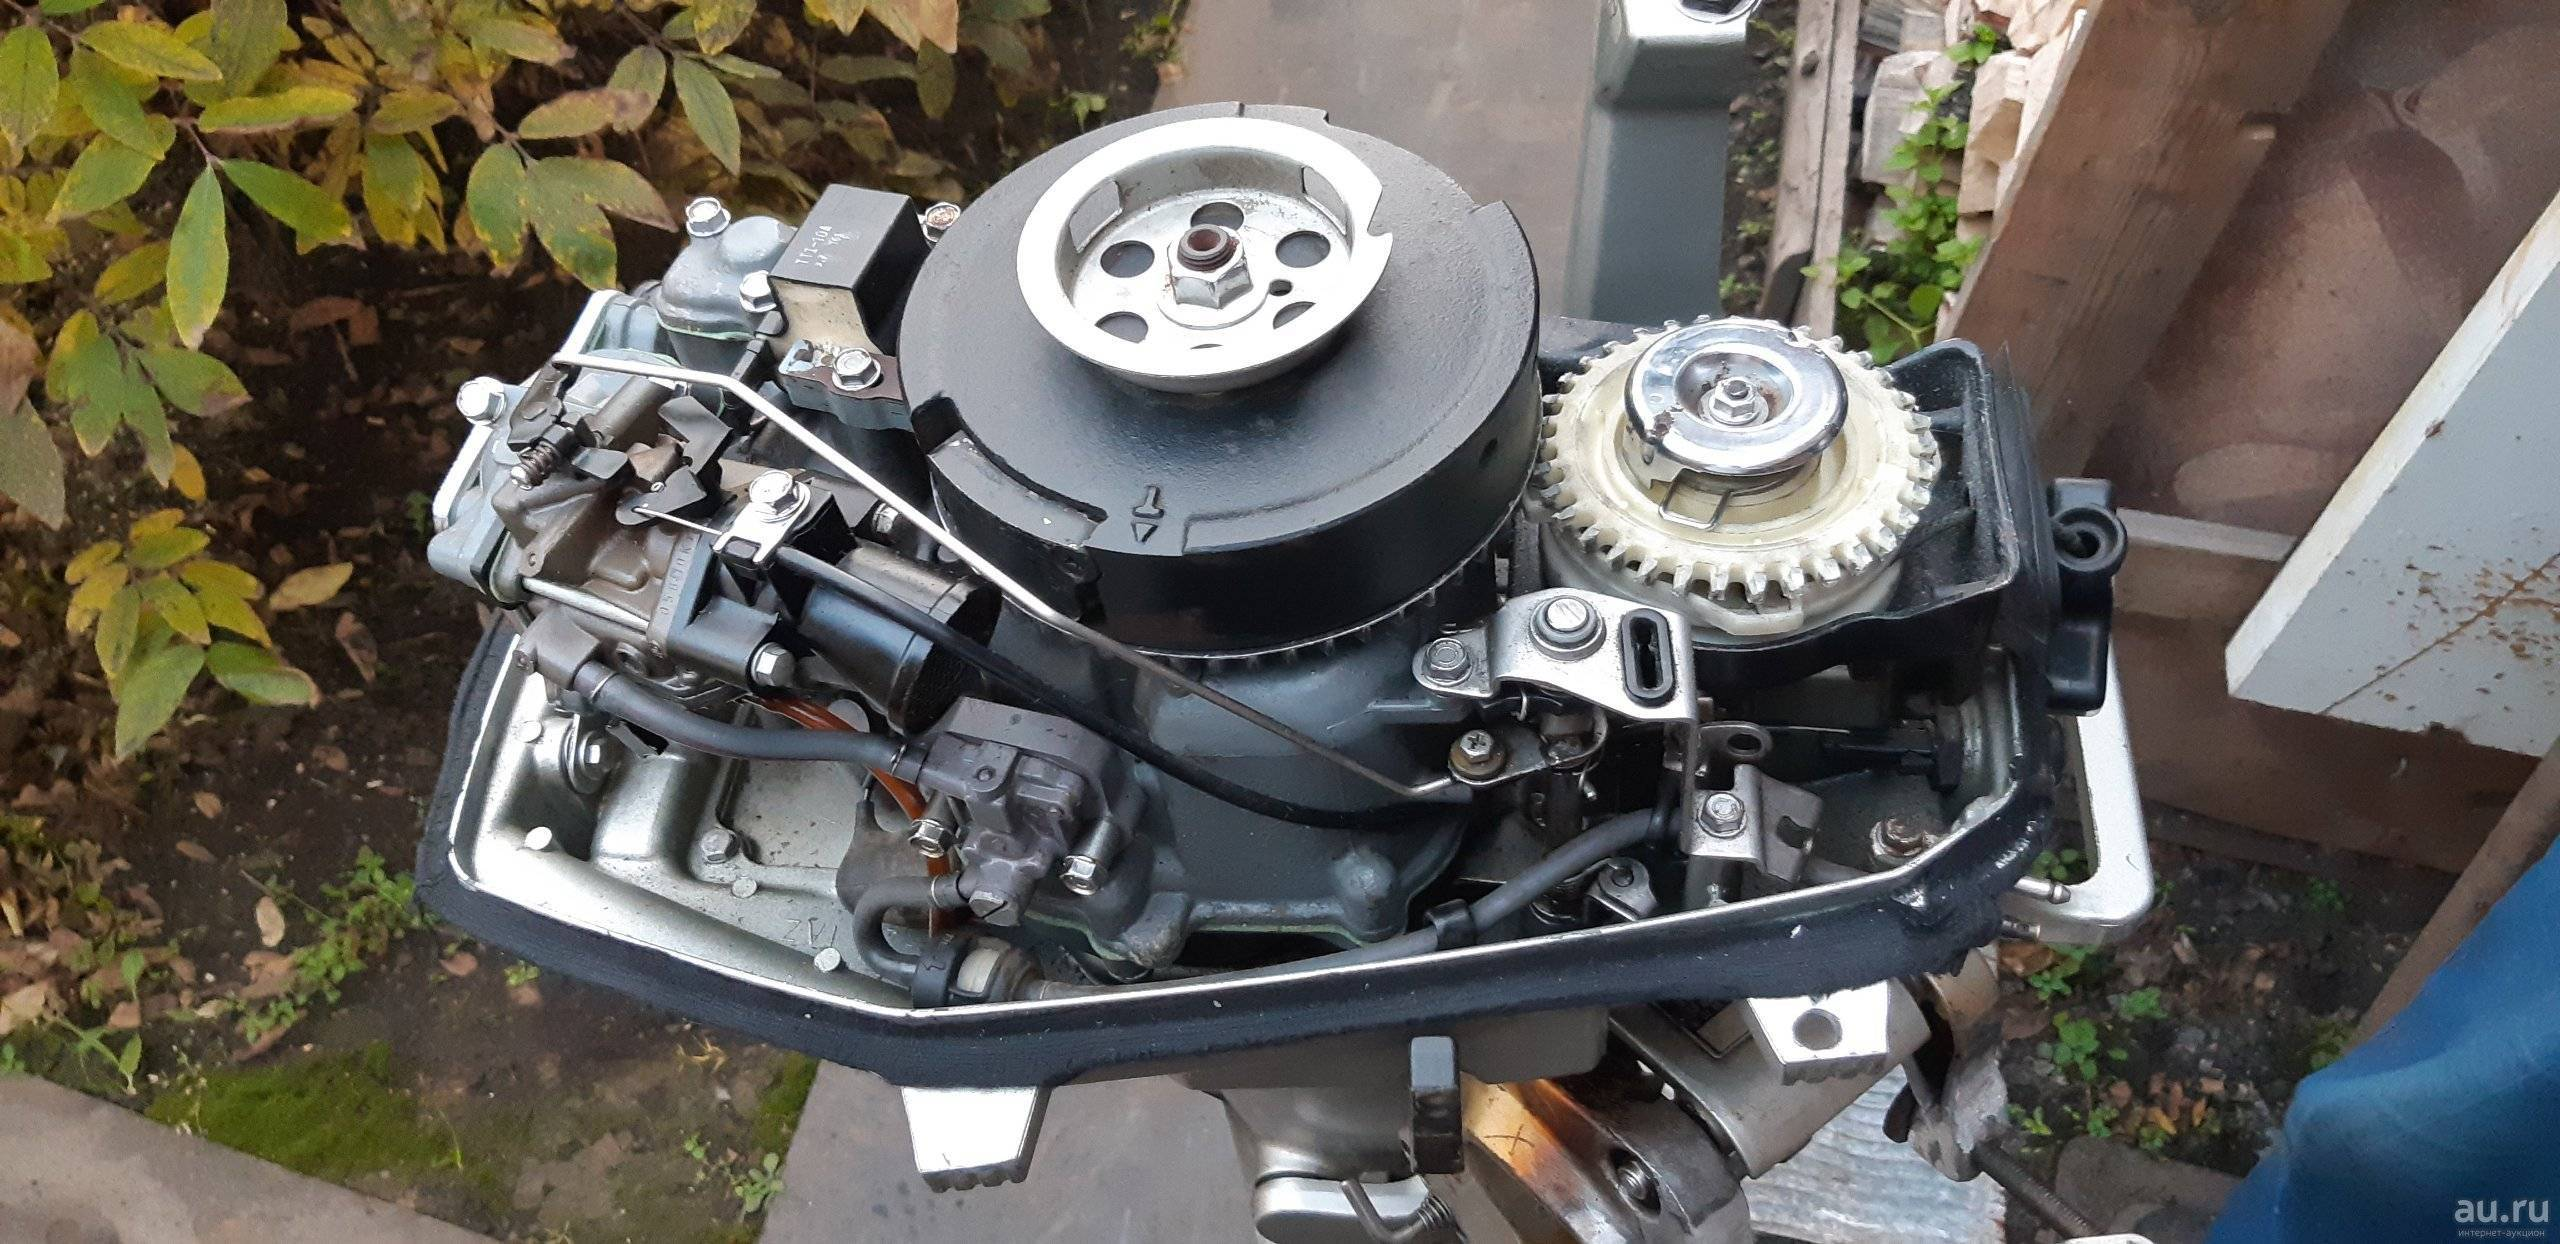 Устройство лодочного мотора на примере Honda BF 5